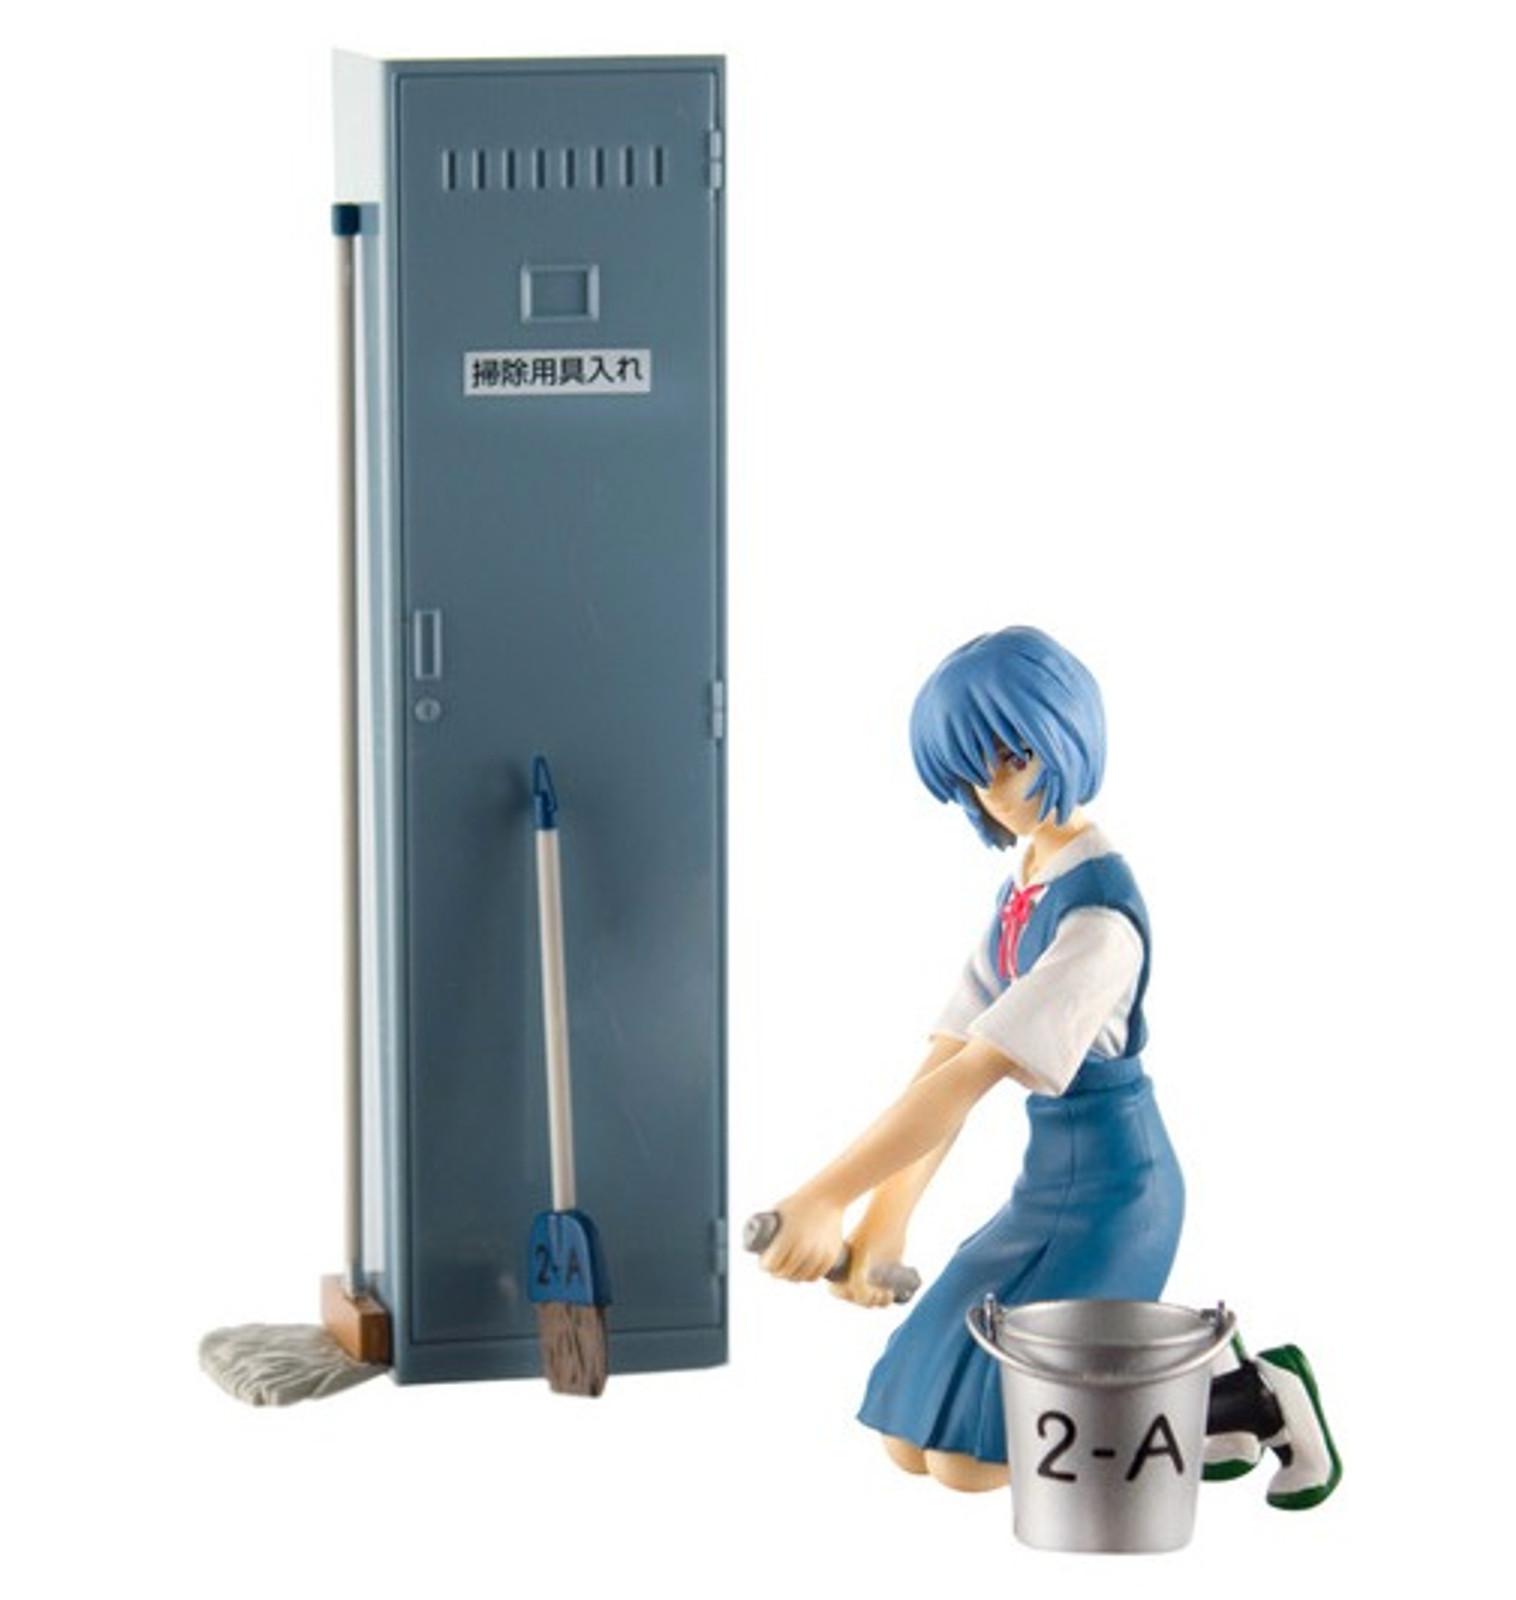 Evangelion Rei Ayanami Cleaning Time Class Room Diorama Figure Set SEGA JAPAN